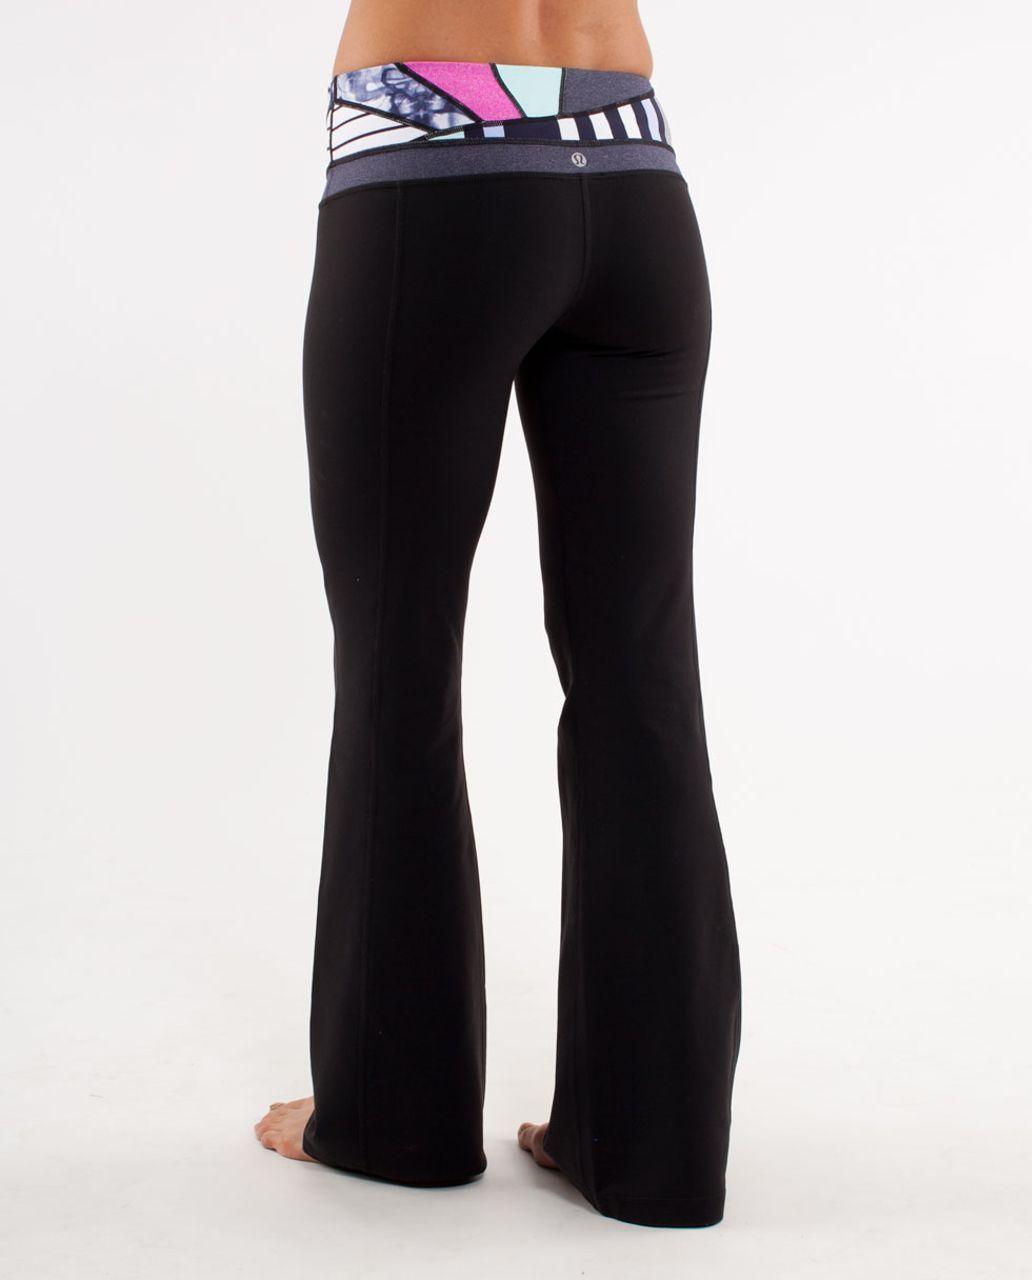 Lululemon Groove Pant (Tall) - Black /  Quilting Spring 13 /  Heathered Deep Indigo